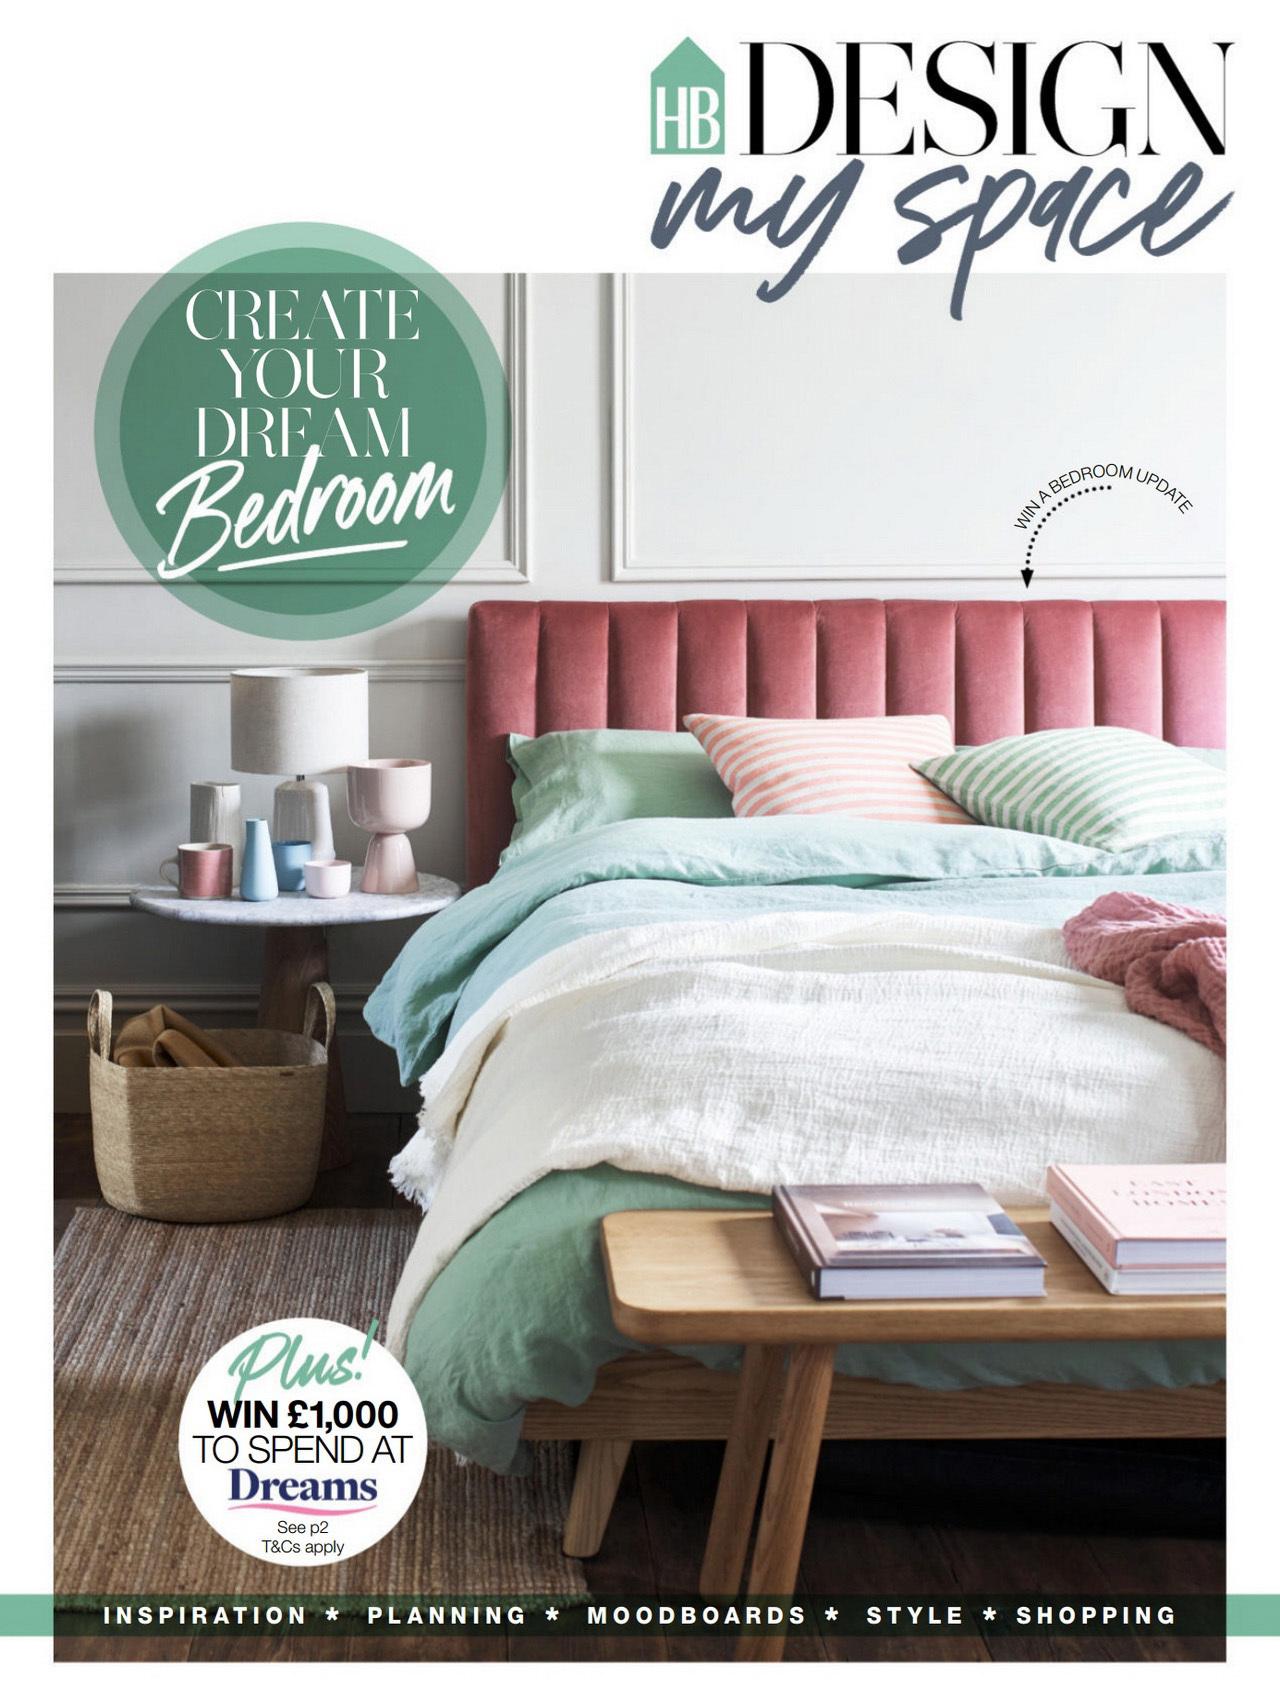 《House Beautiful》英国版家纺杂志2021年08月号(副刊)